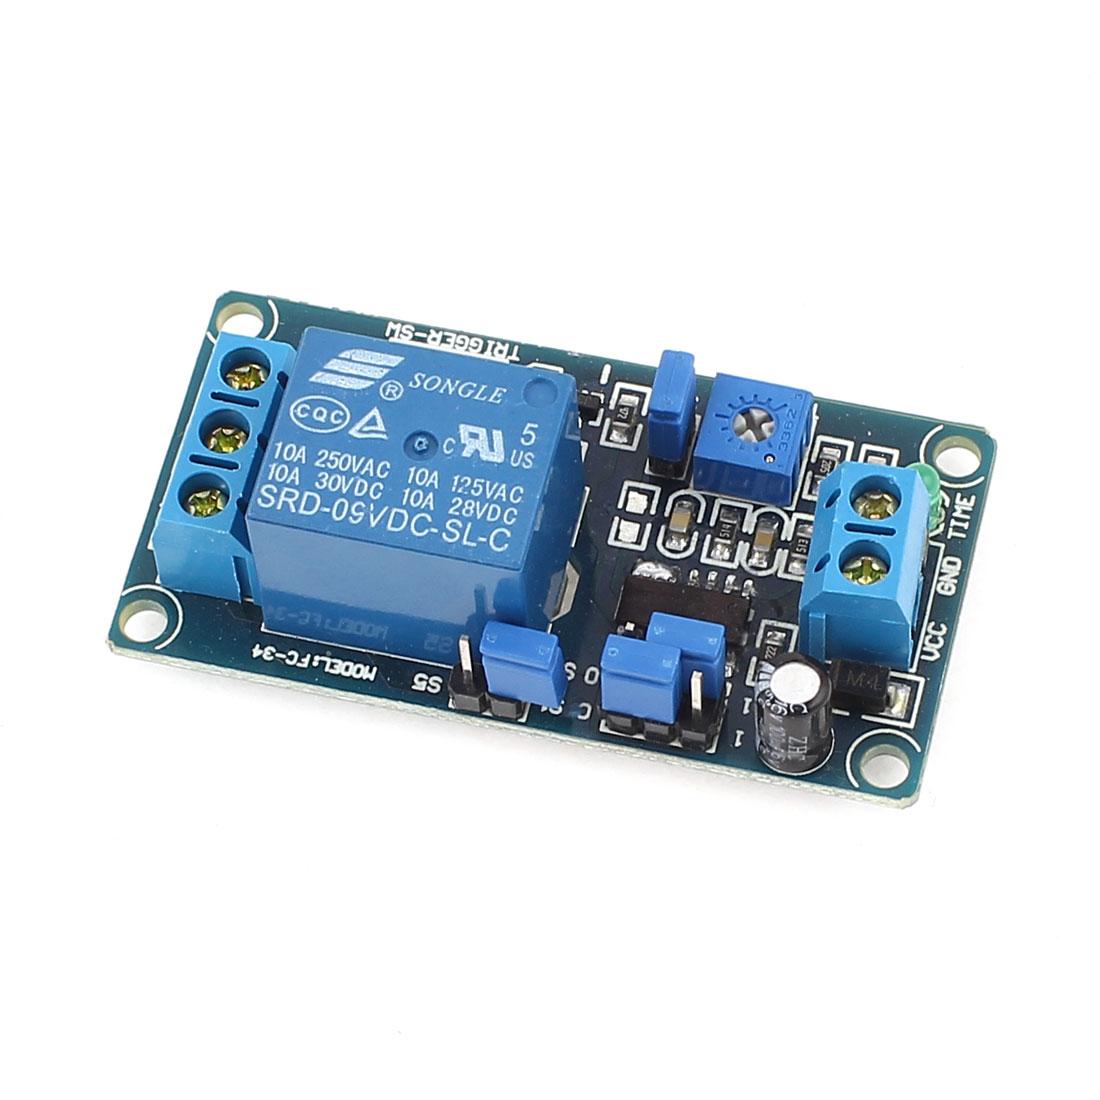 Single Channel Time Delay Relay Module Control Board DC9V FC-34